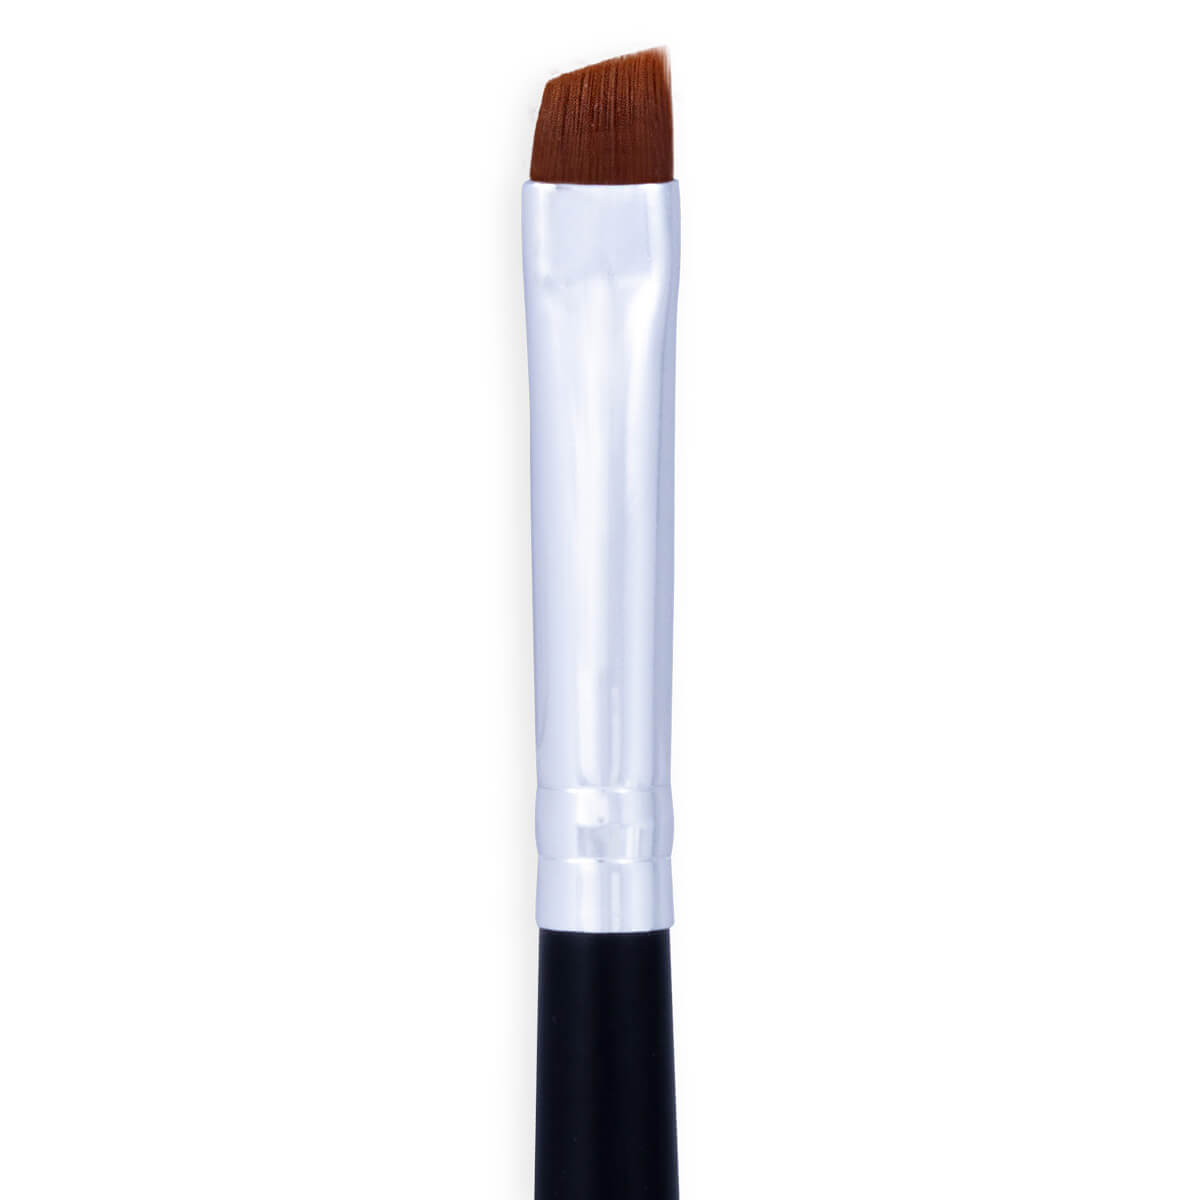 S155 - Pincel Chanfrado Para Delinear Profissional Sffumato Beauty